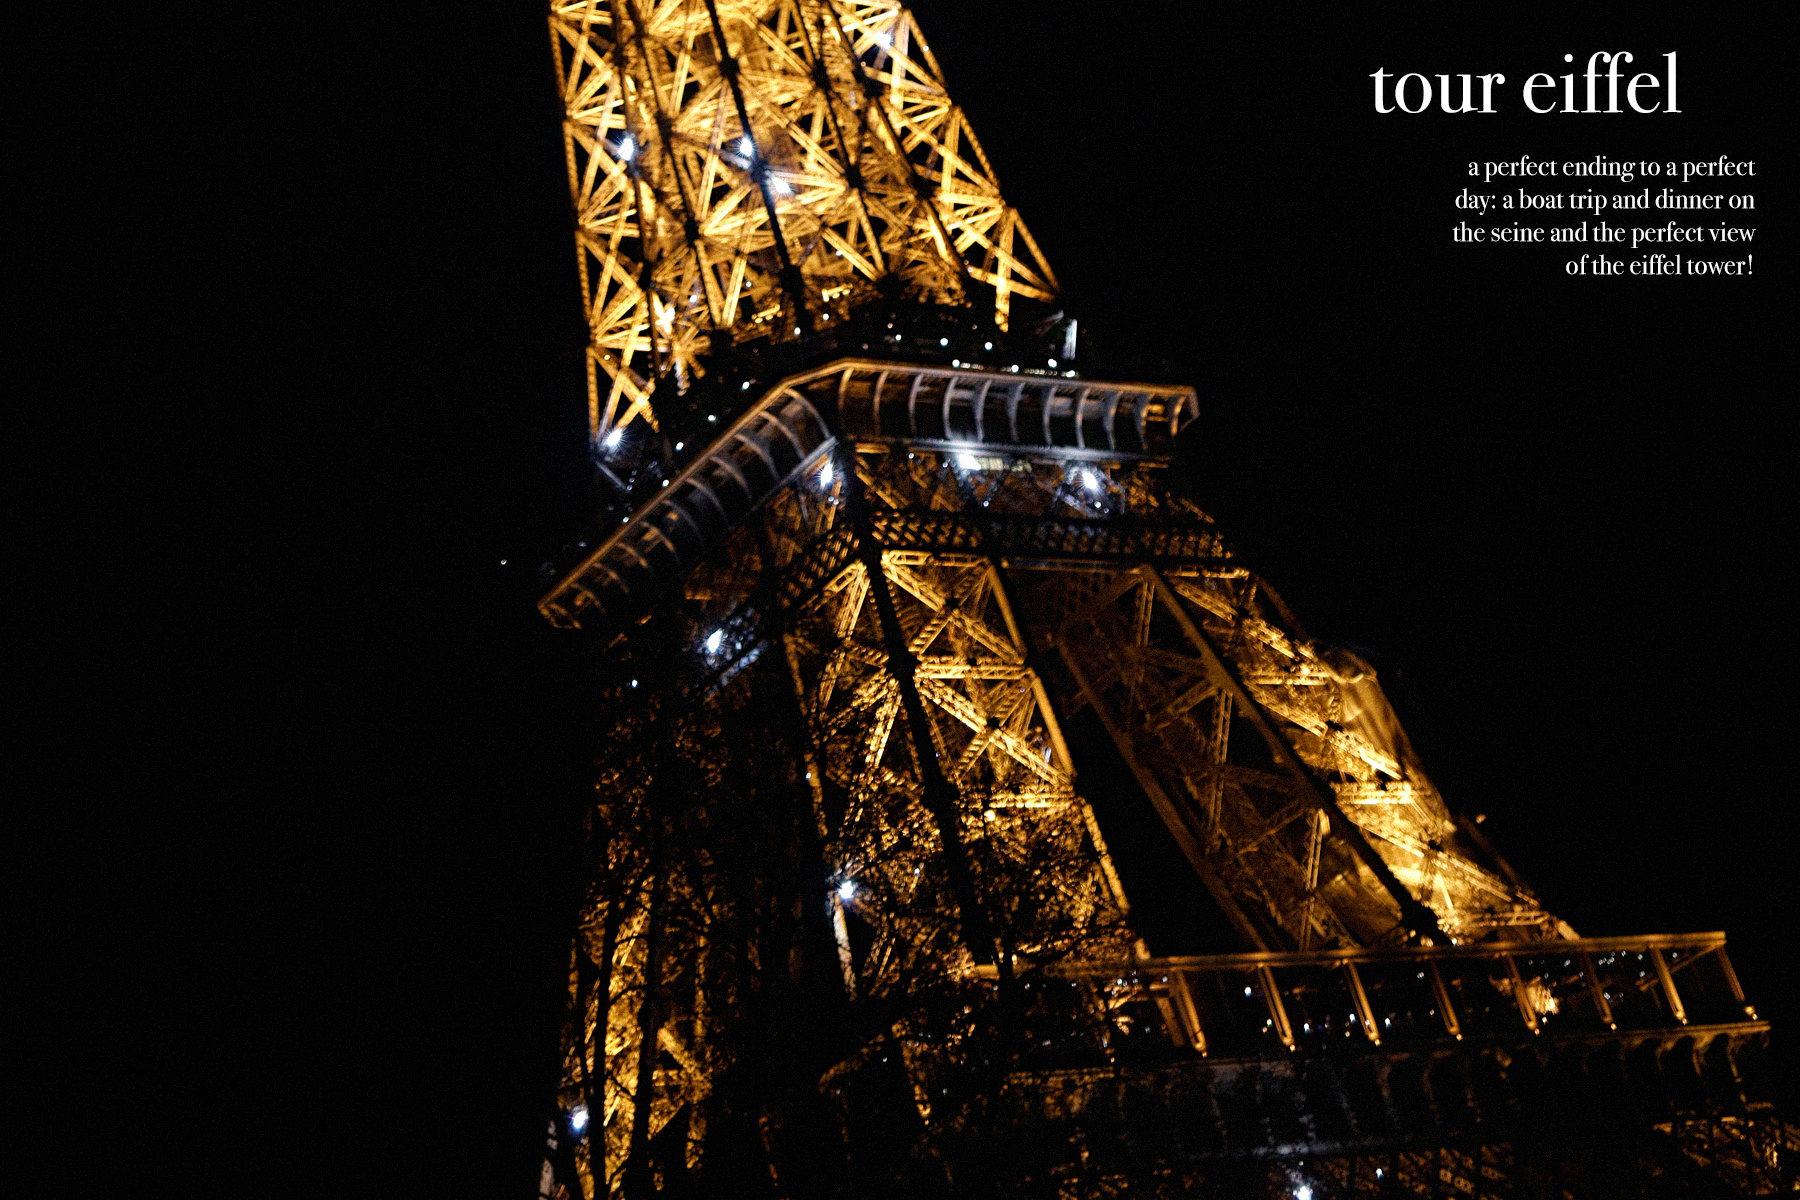 dyson v10 launch paris parisienne press trip launch louvre notre dame eiffel tower sightseeing galeries lafayette parisian style modeblogger lifestyle blog catsanddogsblog ricarda schernus düsseldorf max bechmann fotografie film 1